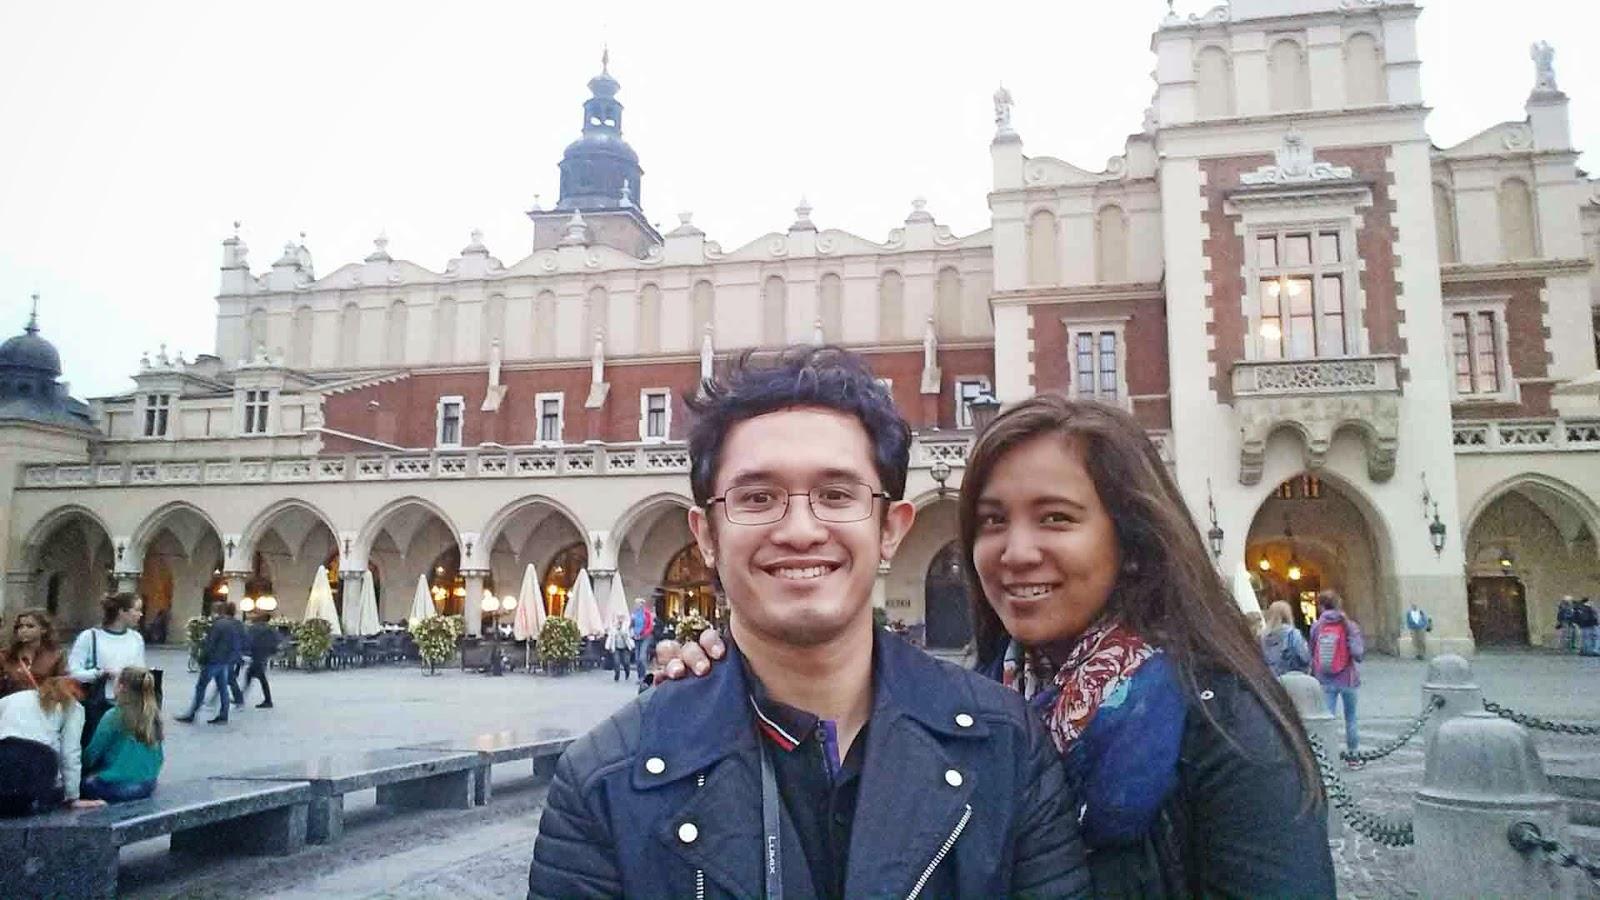 Selfie at Krakow Market Square